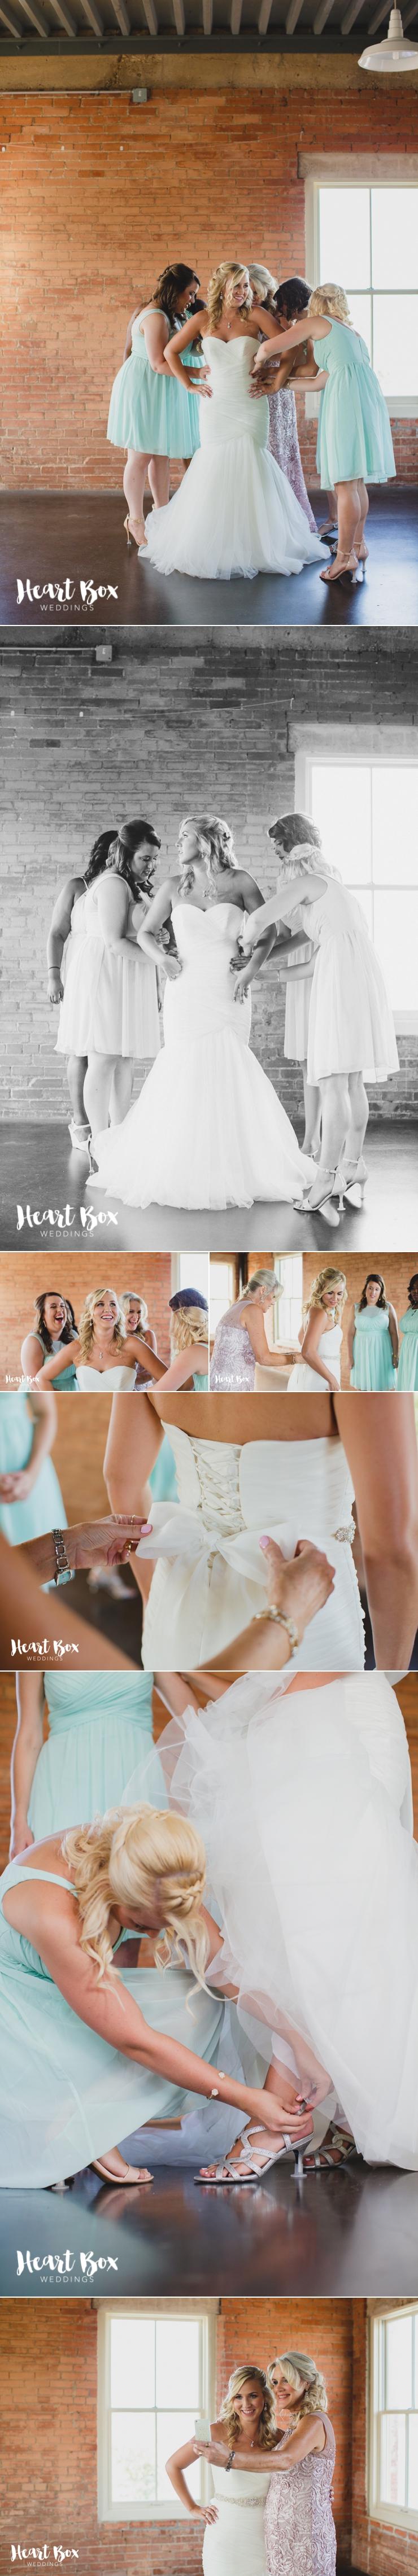 Gould Wedding Blog Collages 3.jpg